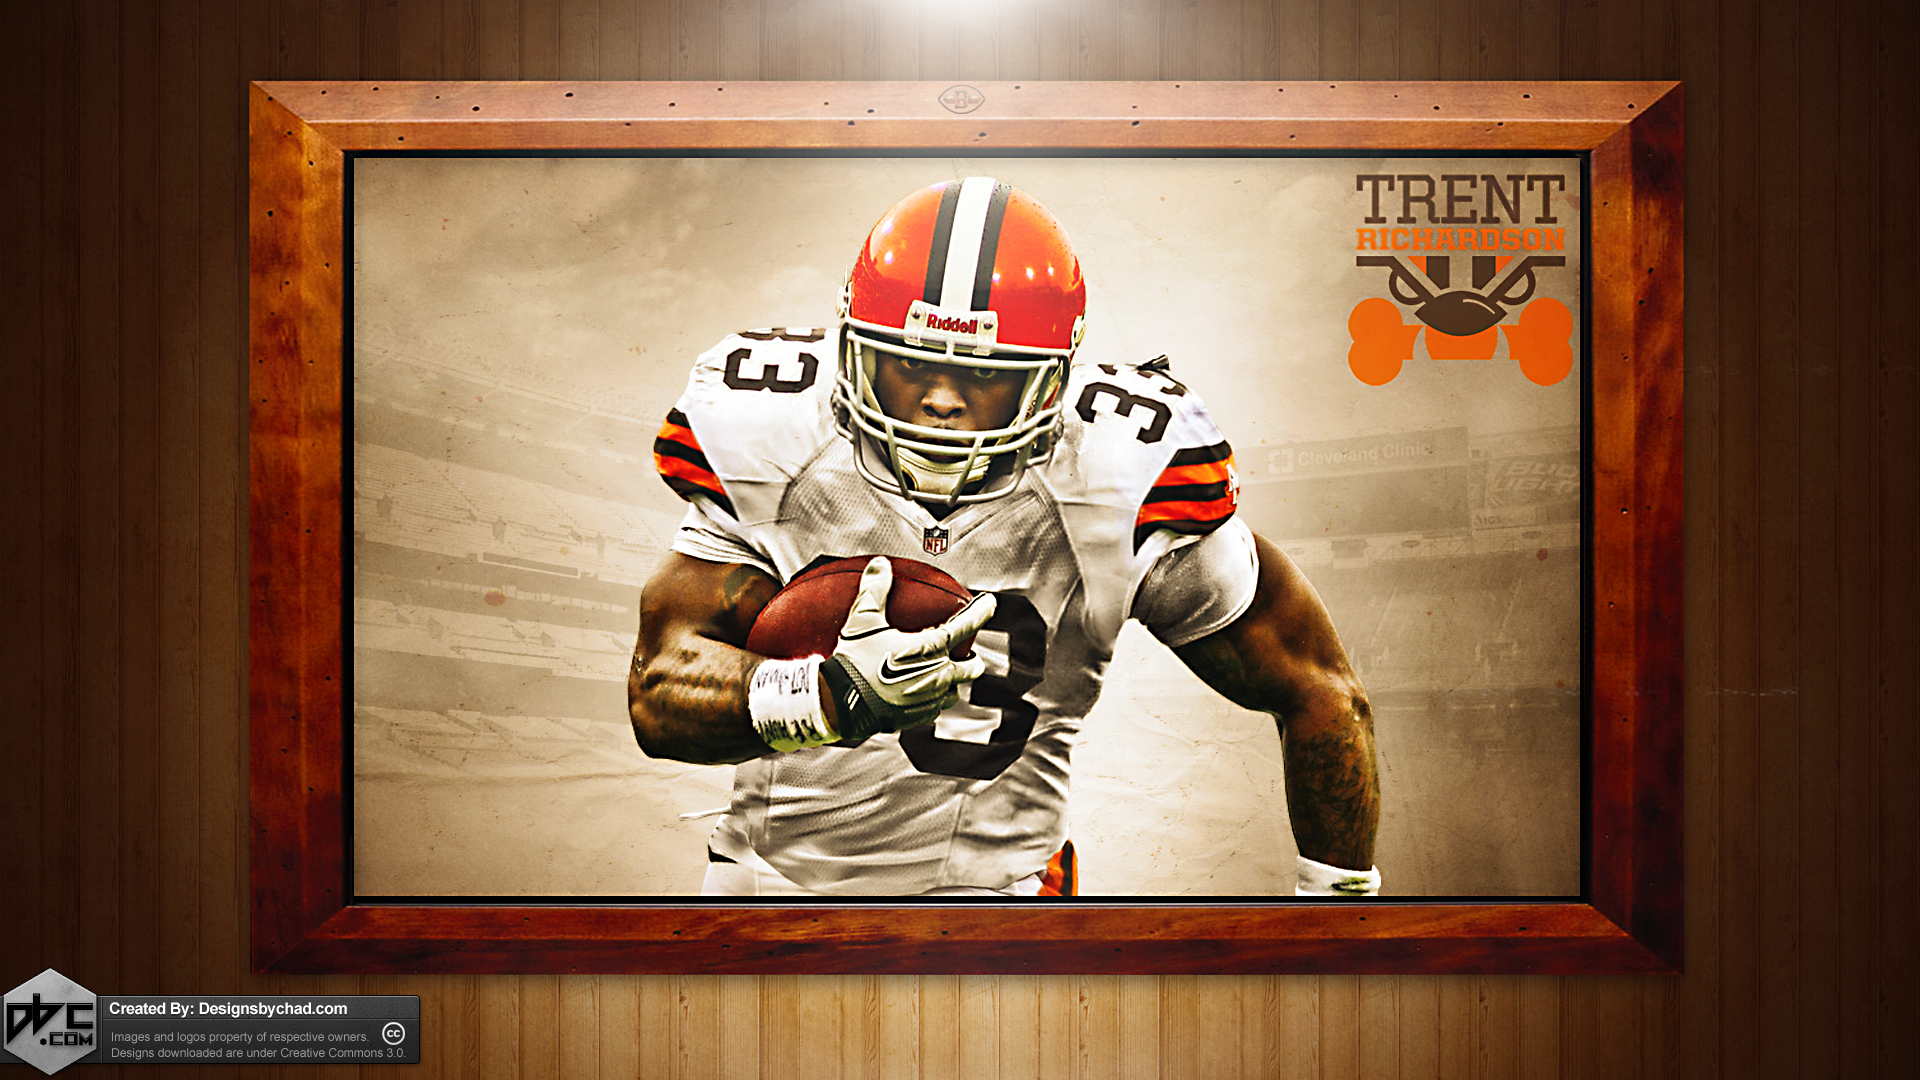 Cleveland Browns HD Wallpaper - WallpaperSafari